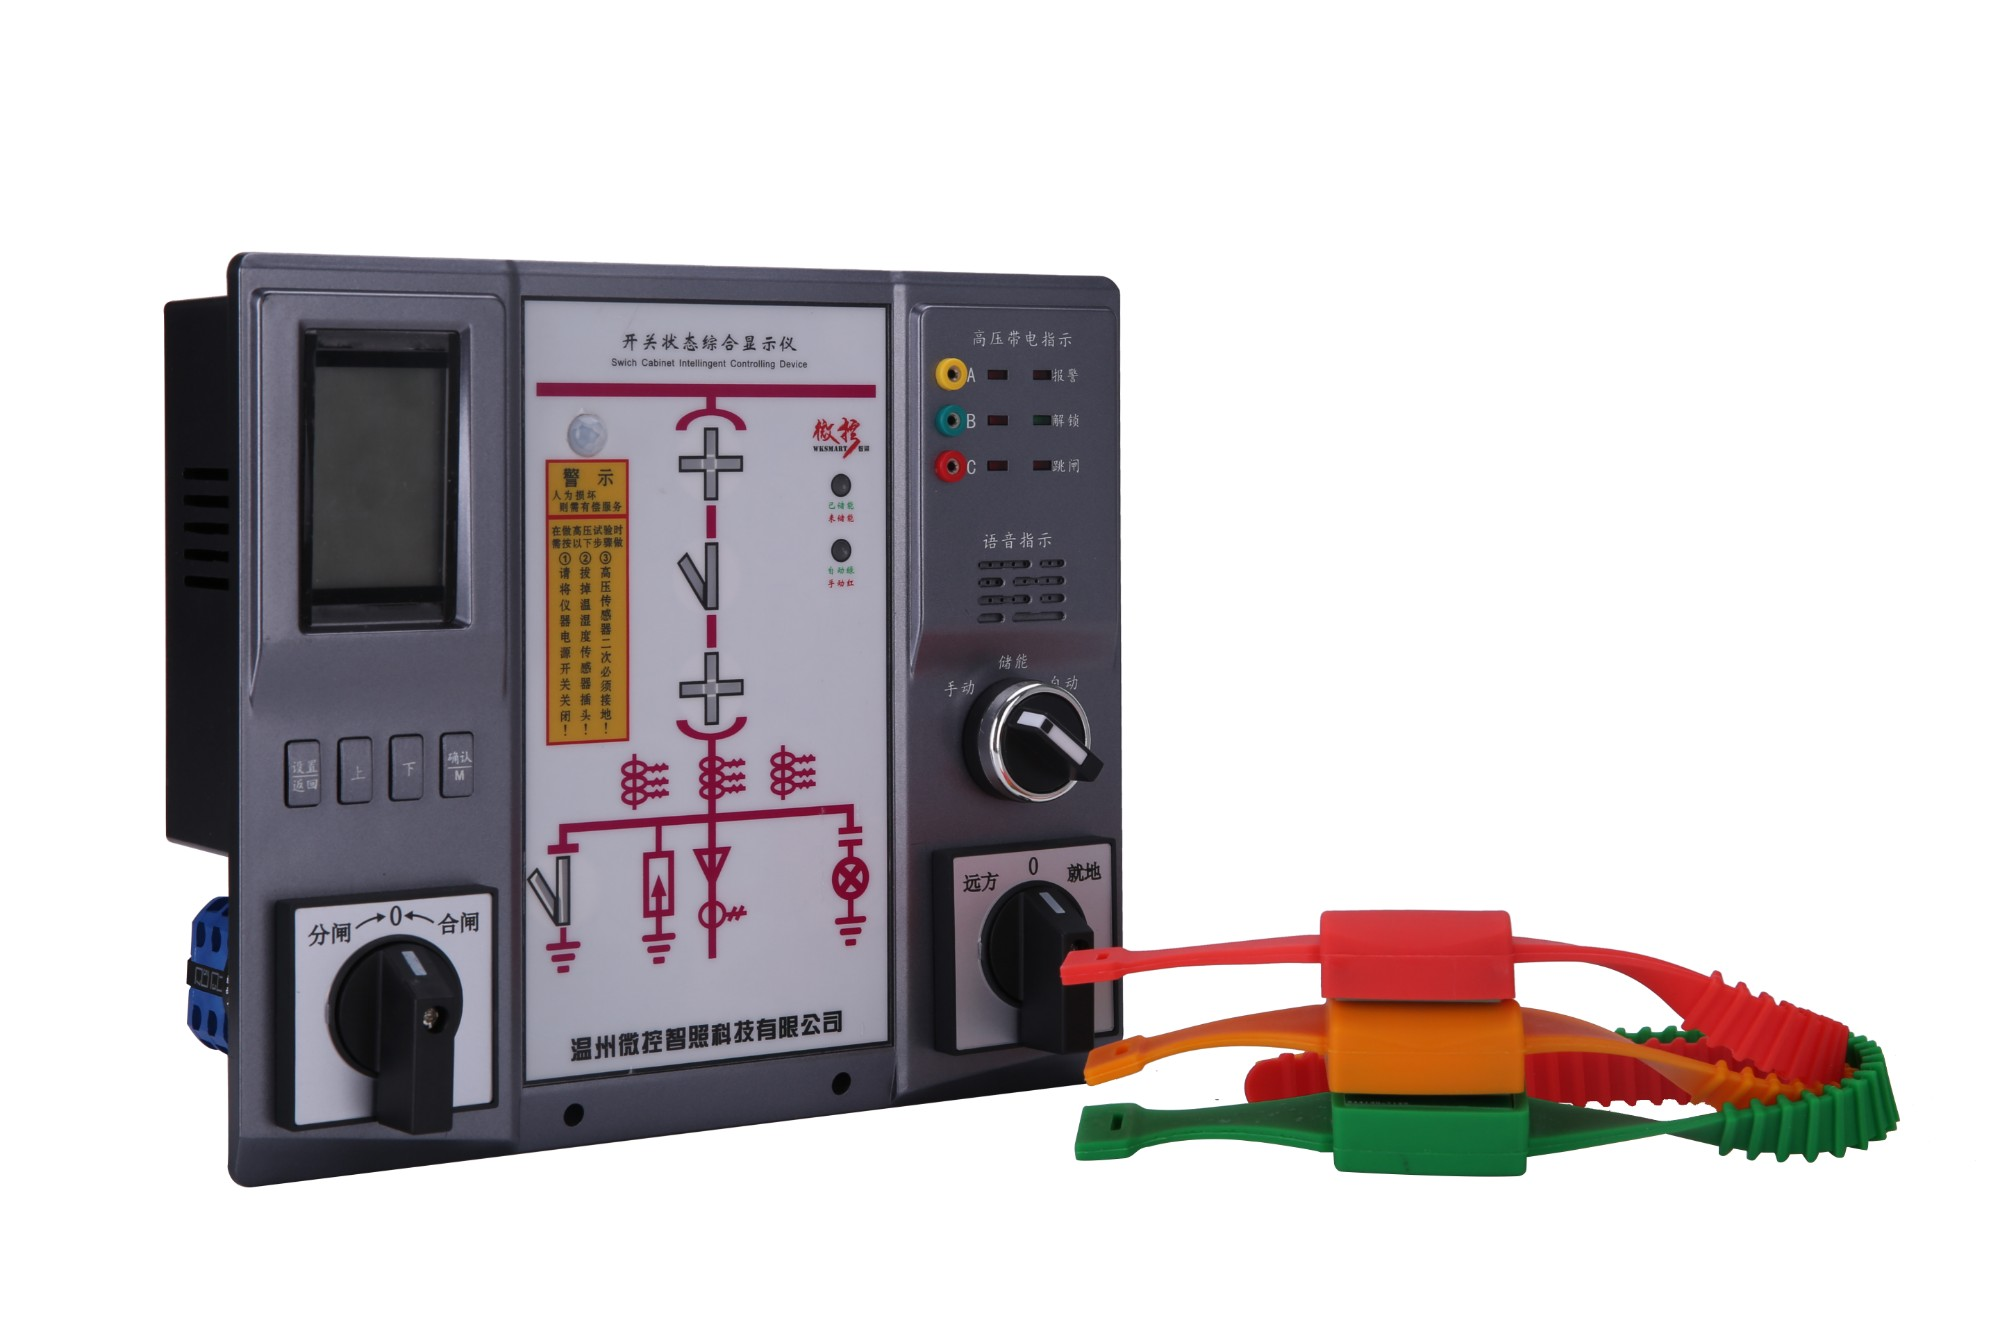 MS.CK-400系列LCD液晶型智能操控装置+电气接点测温